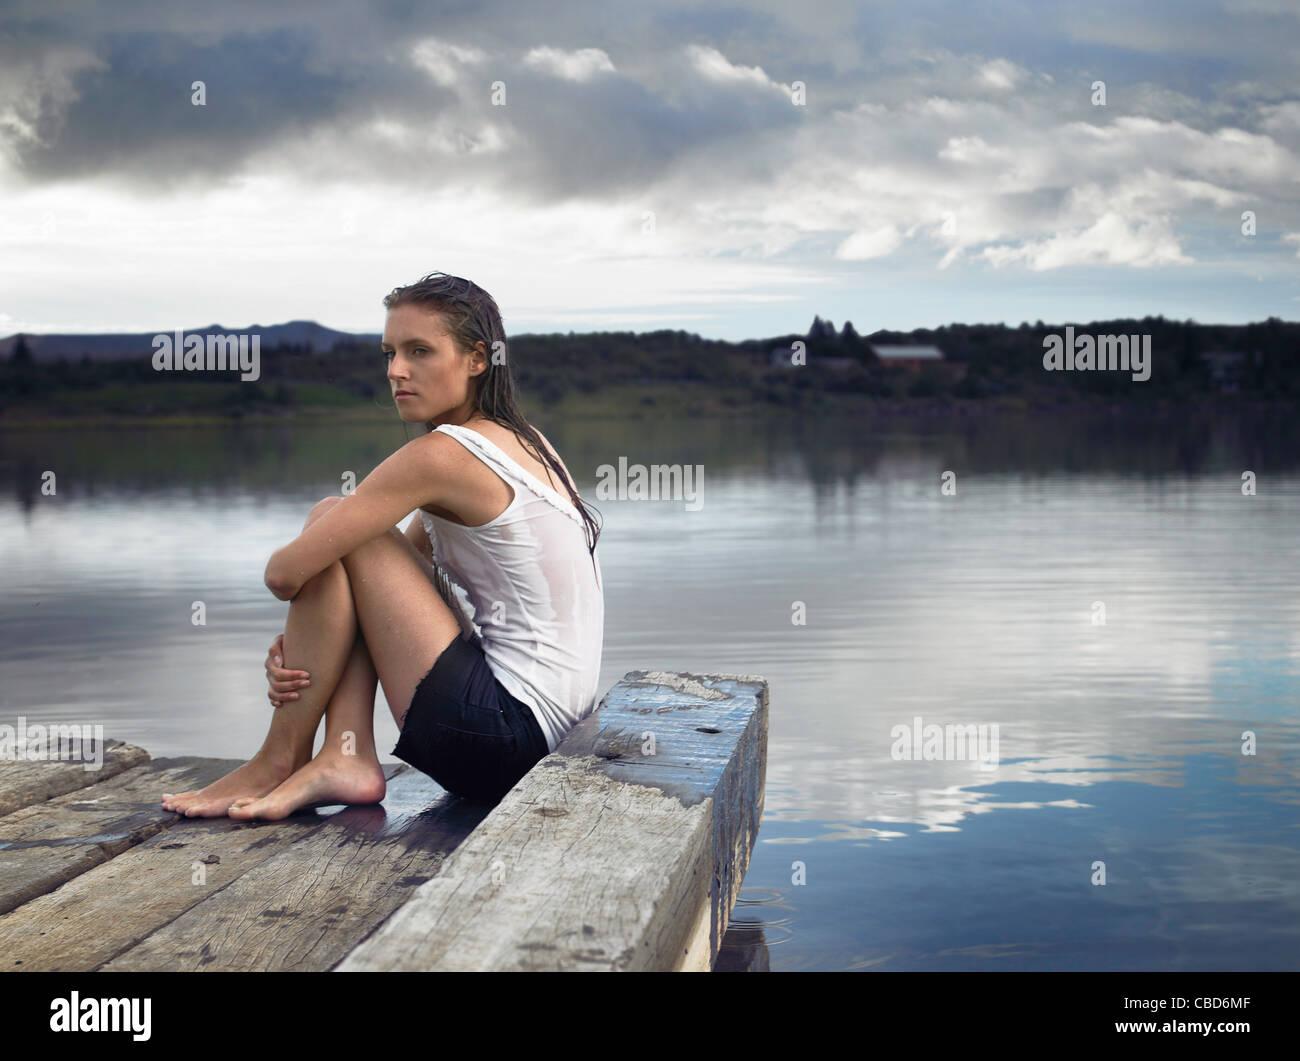 Woman sitting on dock by lake - Stock Image